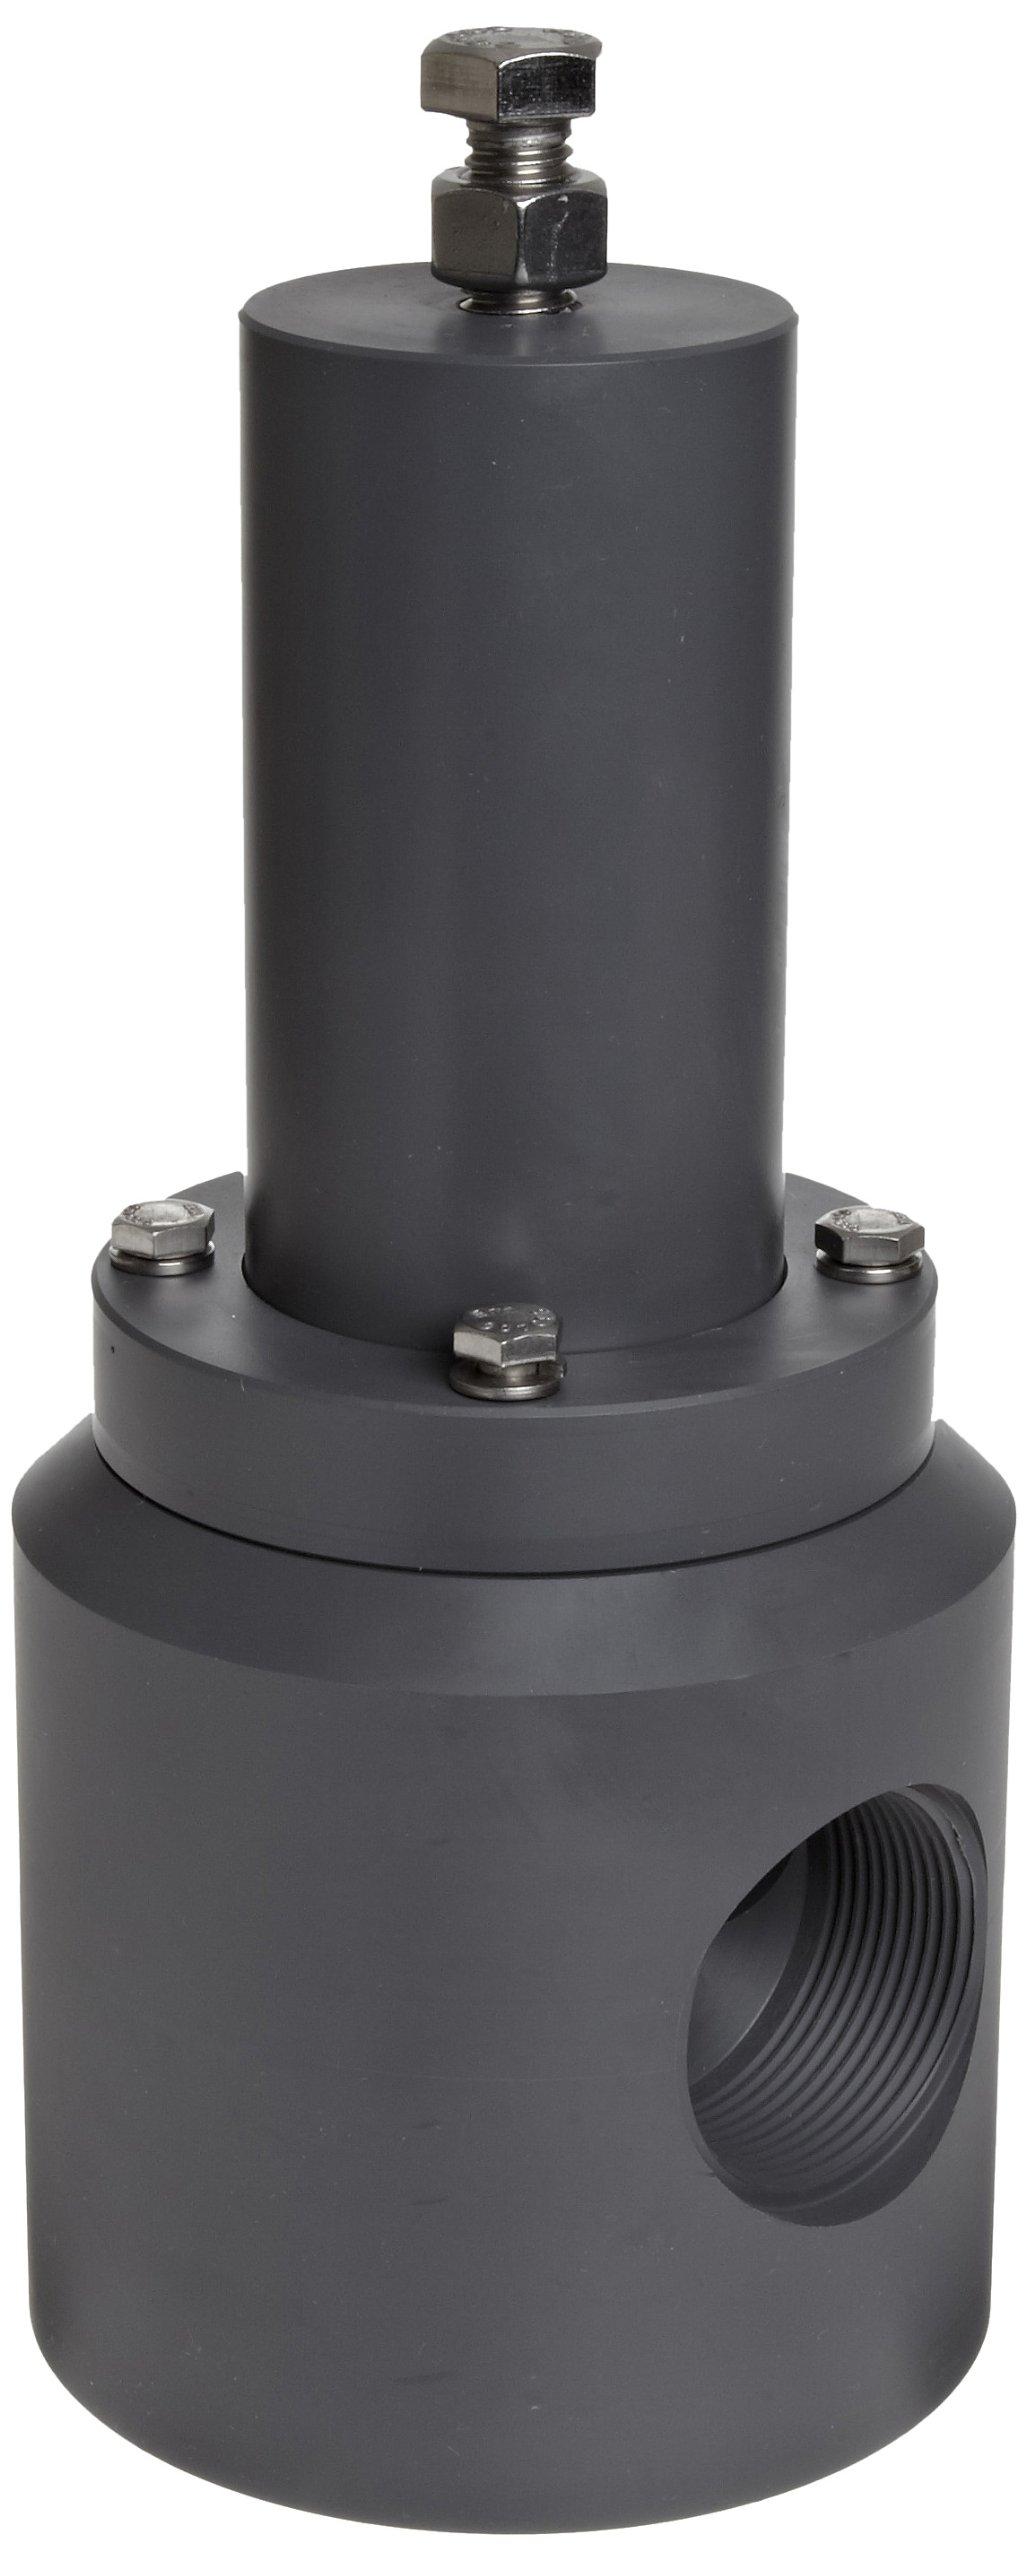 Plast-O-Matic RVT Series PVC Relief Valve, For Acids and Highly Corrosive Liquids, 5-100 psi Pressure Range, 1'' NPT Female